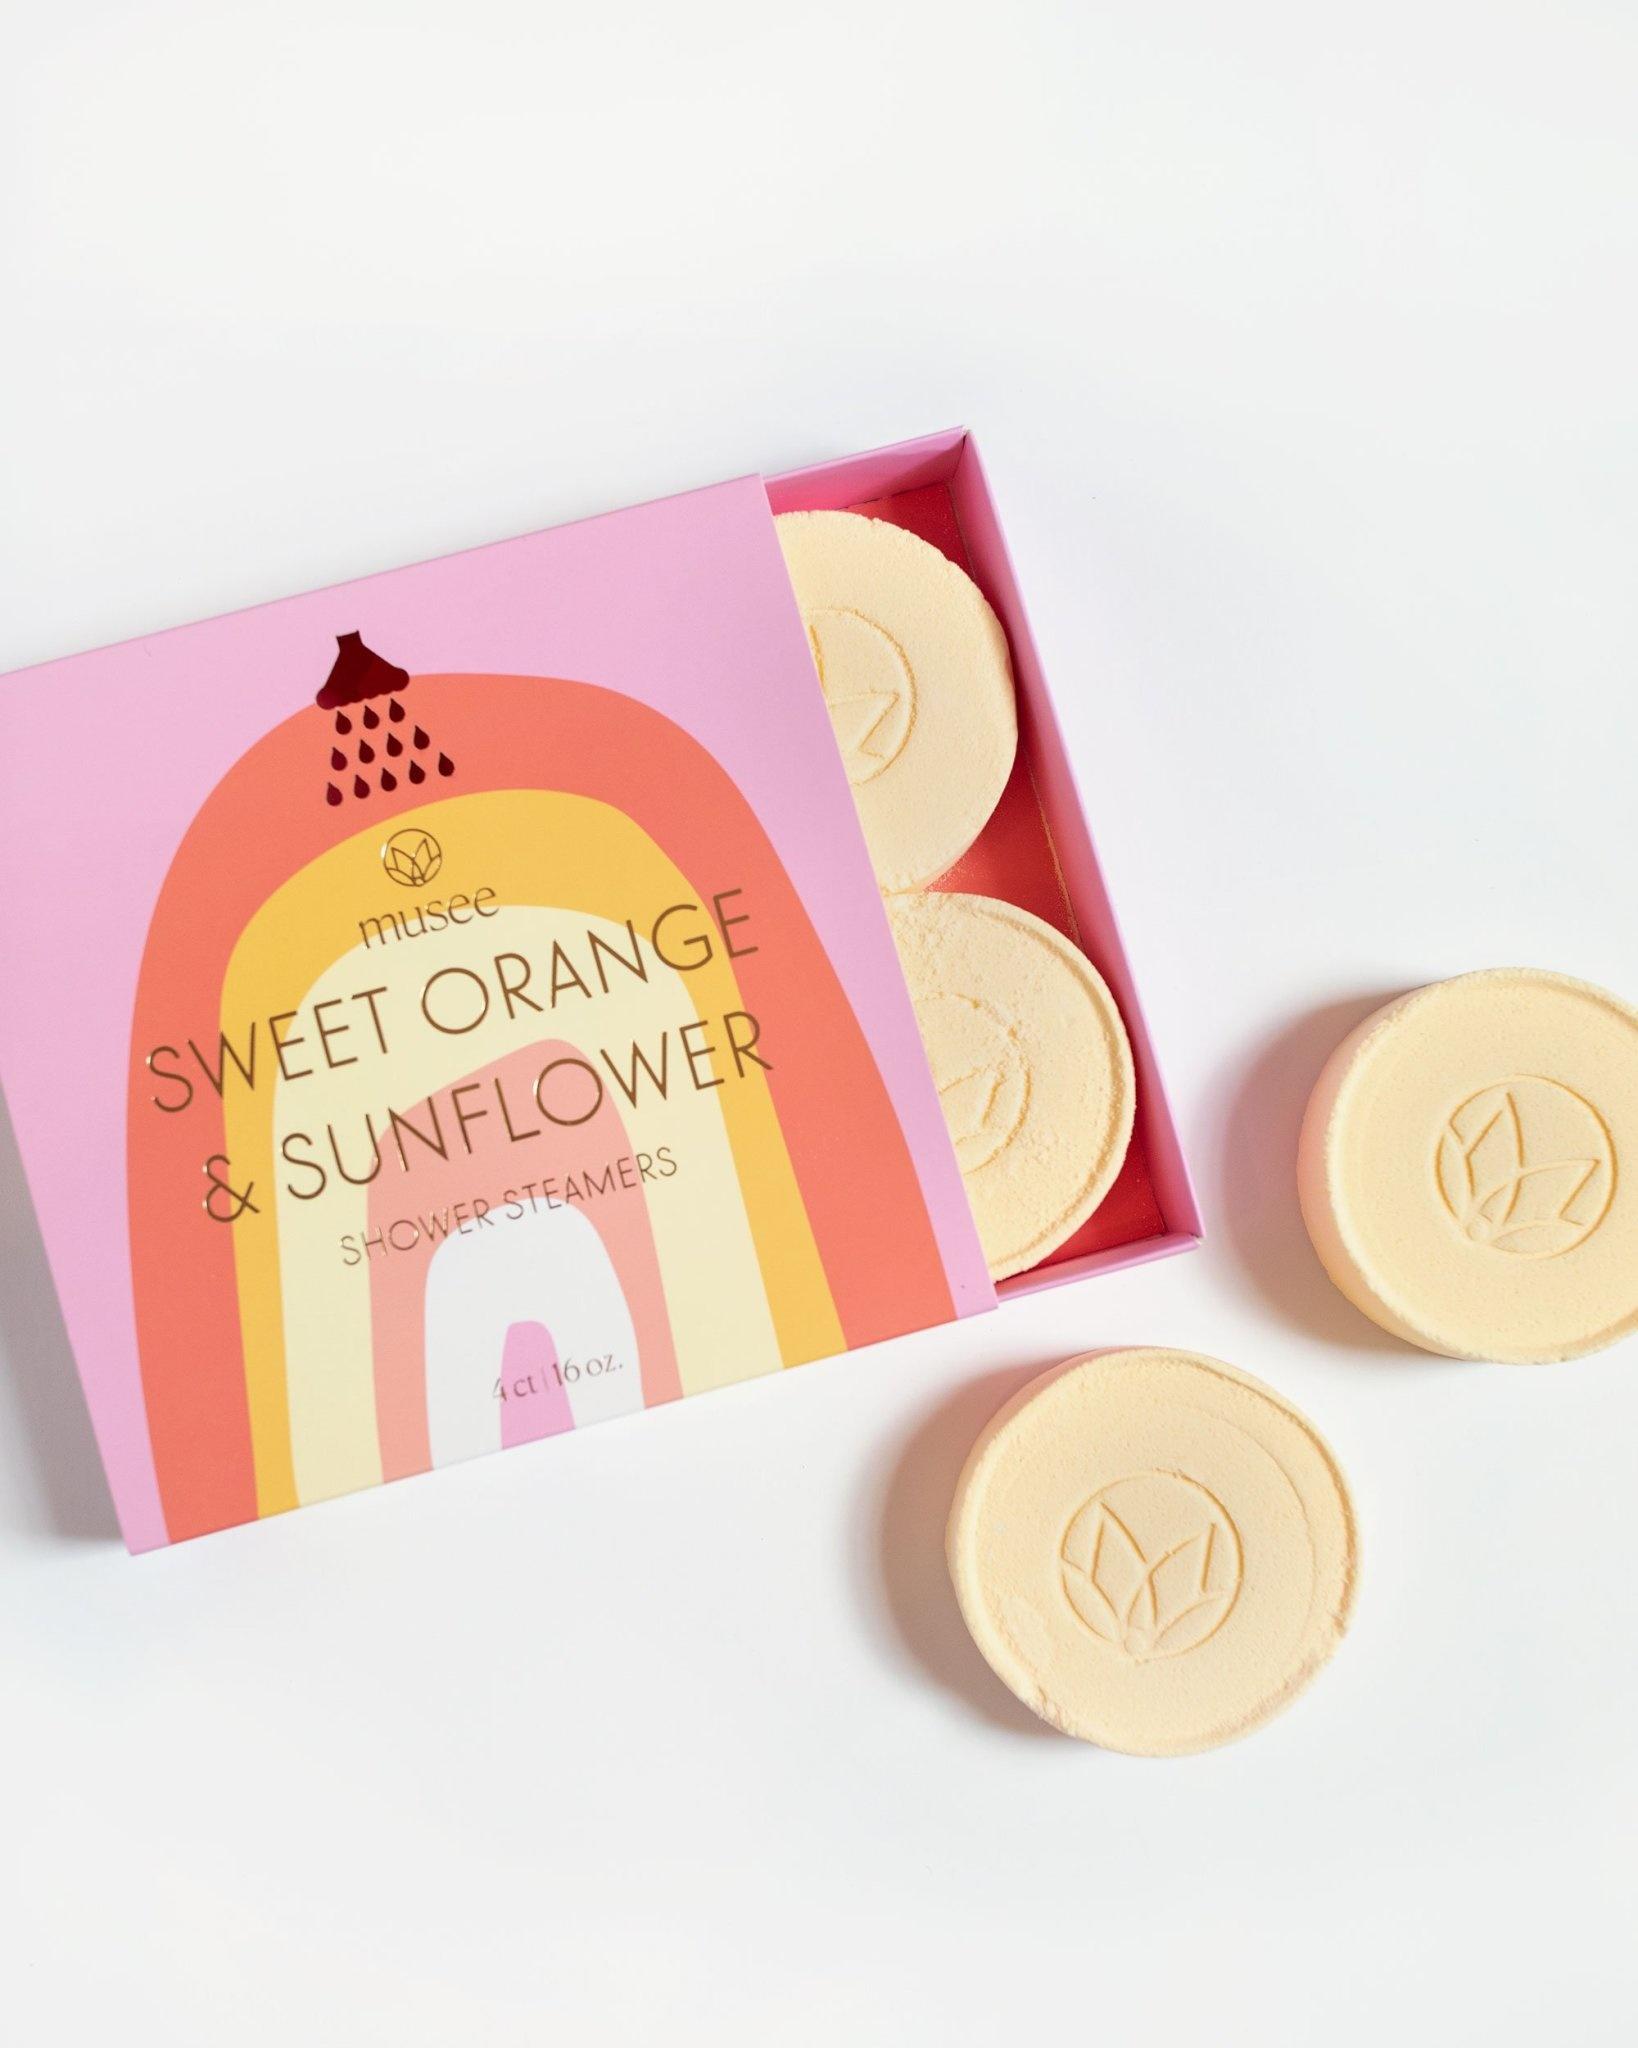 Musee Shower Steamers-Sweet Orange & Sunflower